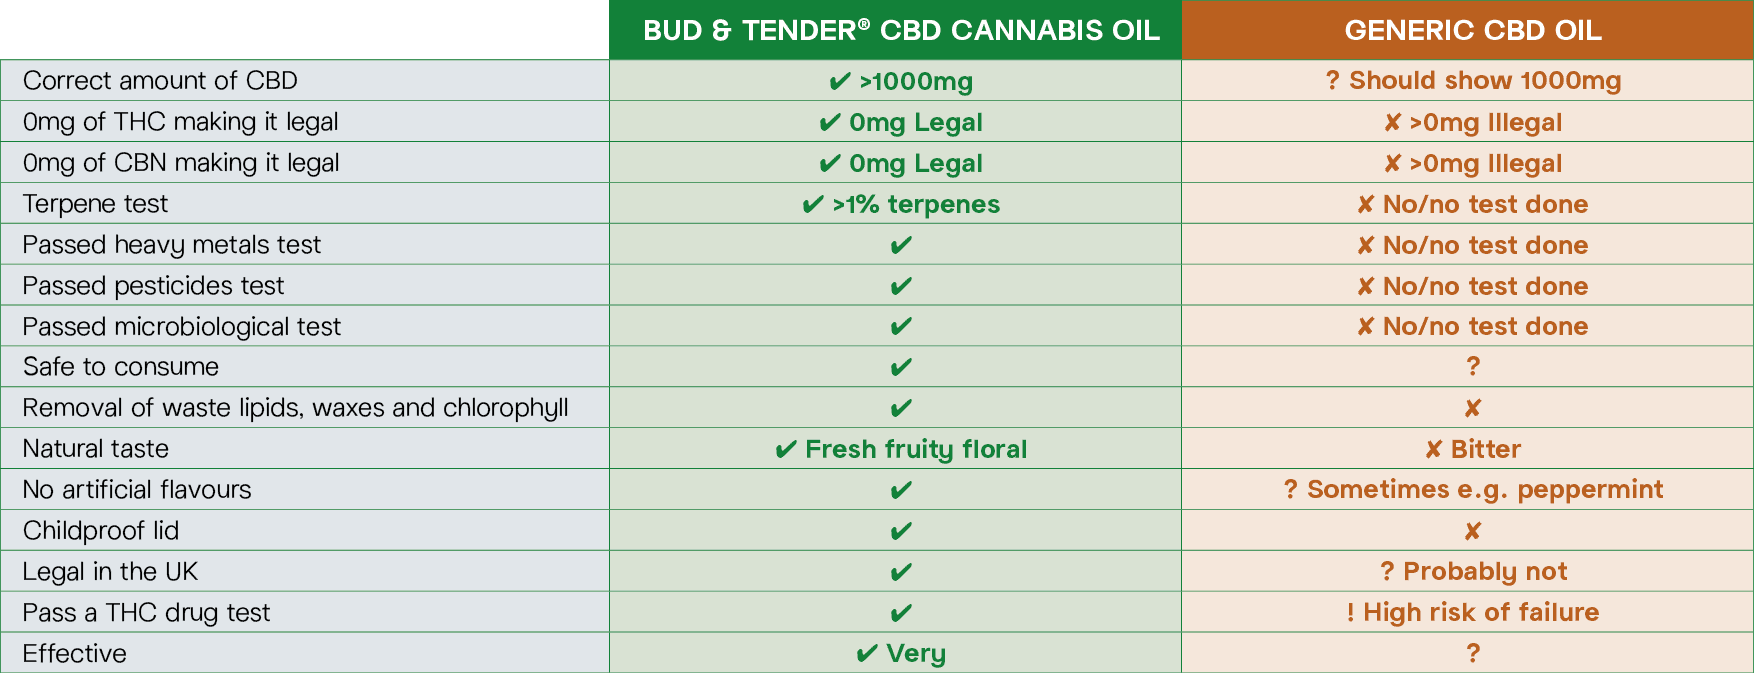 Bud & Tender Comparison Table